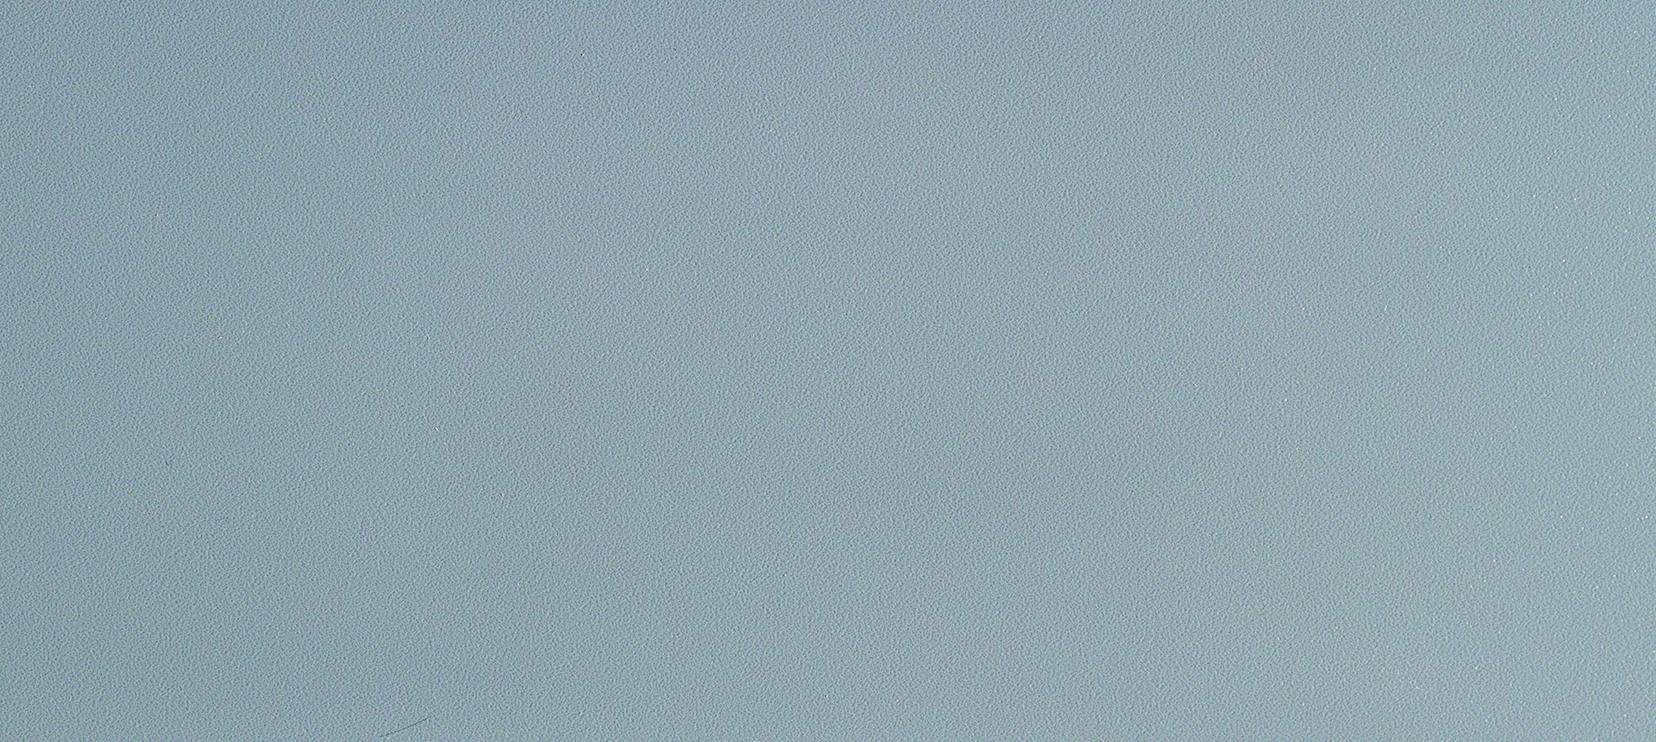 RAL 7004 - Signalgrau glatt - Art. 70040